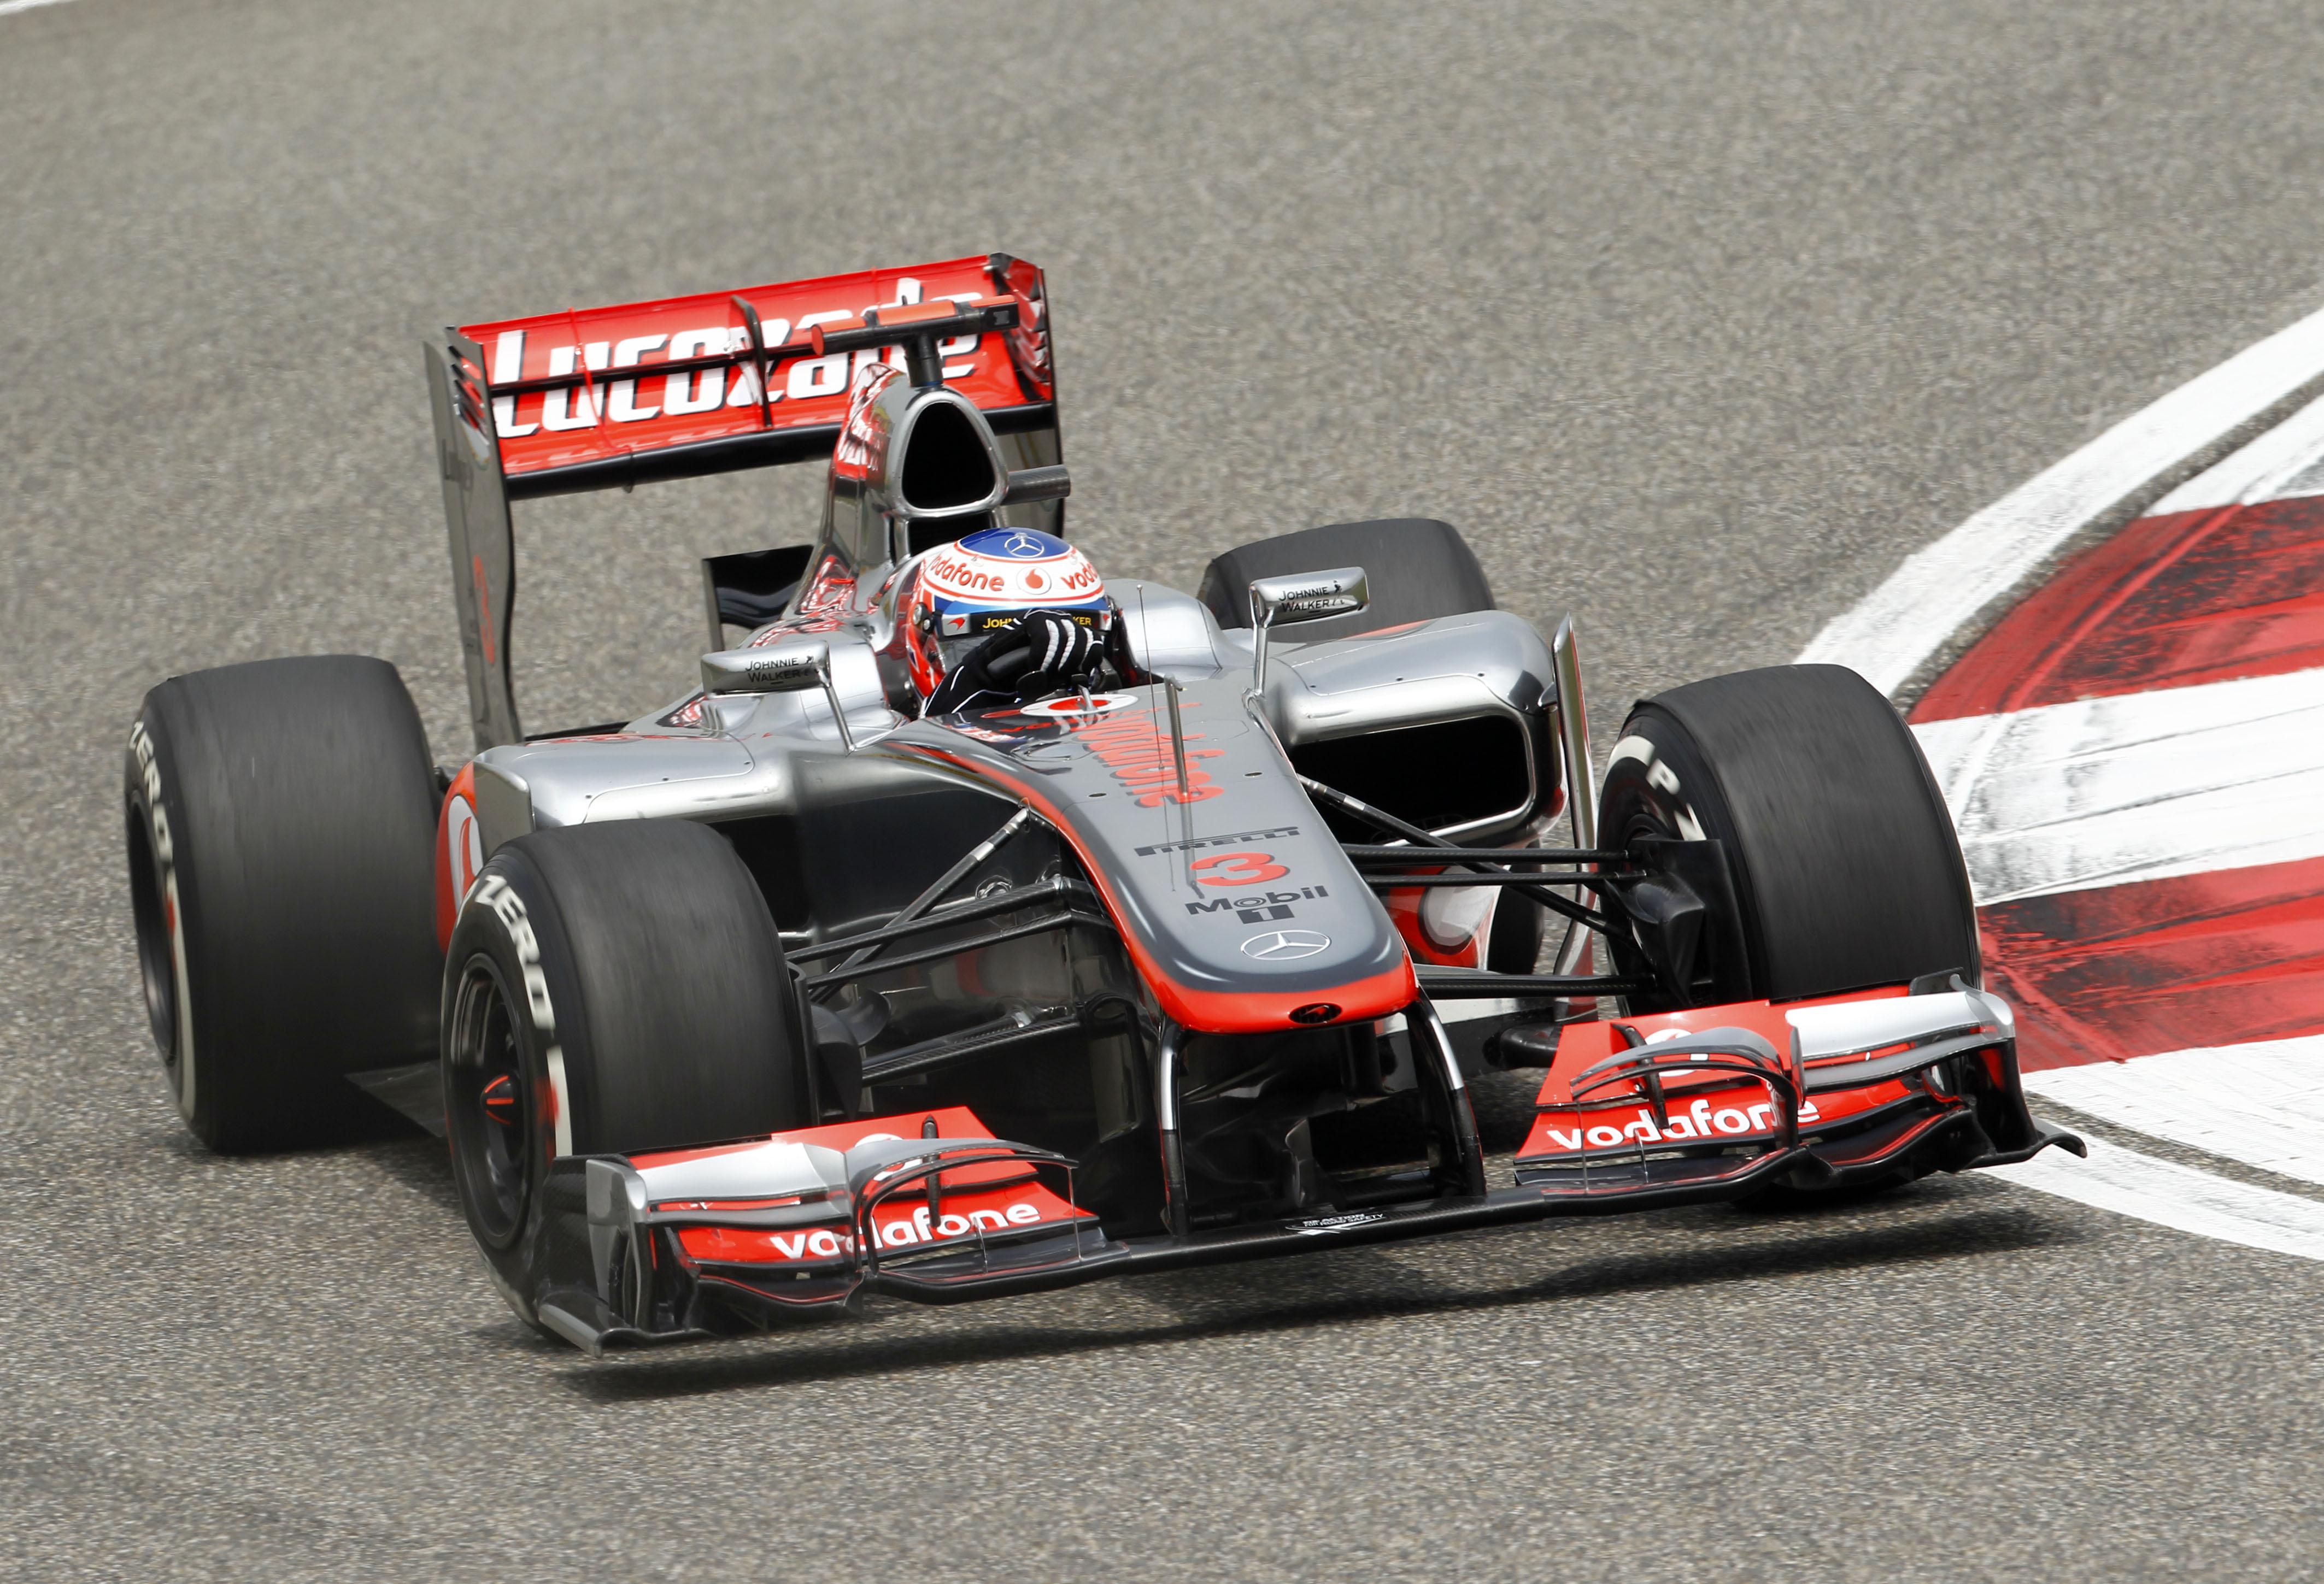 f1 - 2012 chinese grand prix results - vodafone mclaren mercedes